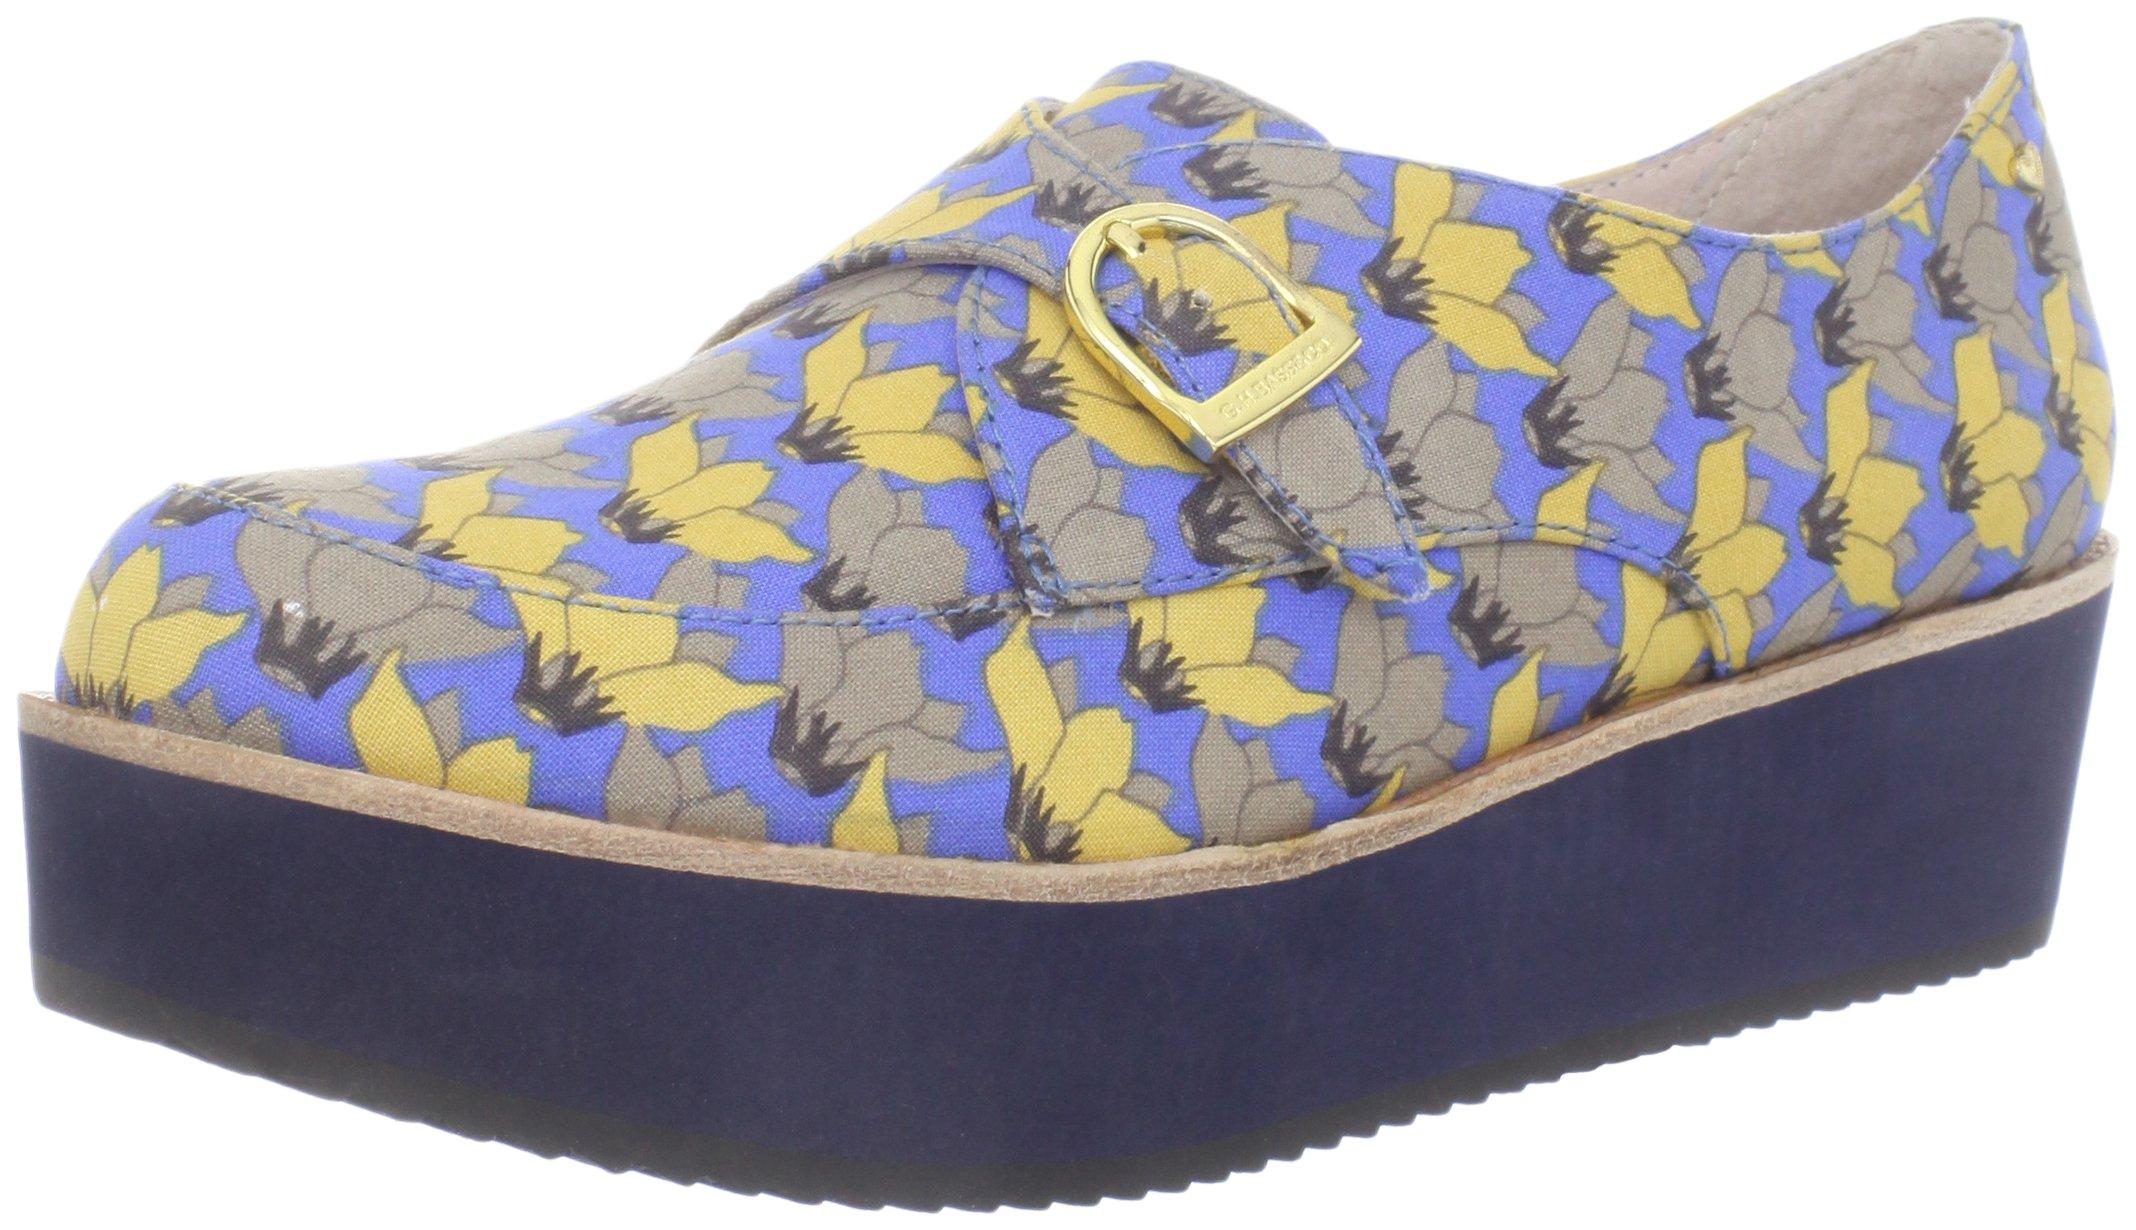 Bass Loves Rachel Antonoff Women's Fleur Loafer, Blue Floral, 6 M US by Bass Loves Rachel Antonoff (Image #1)